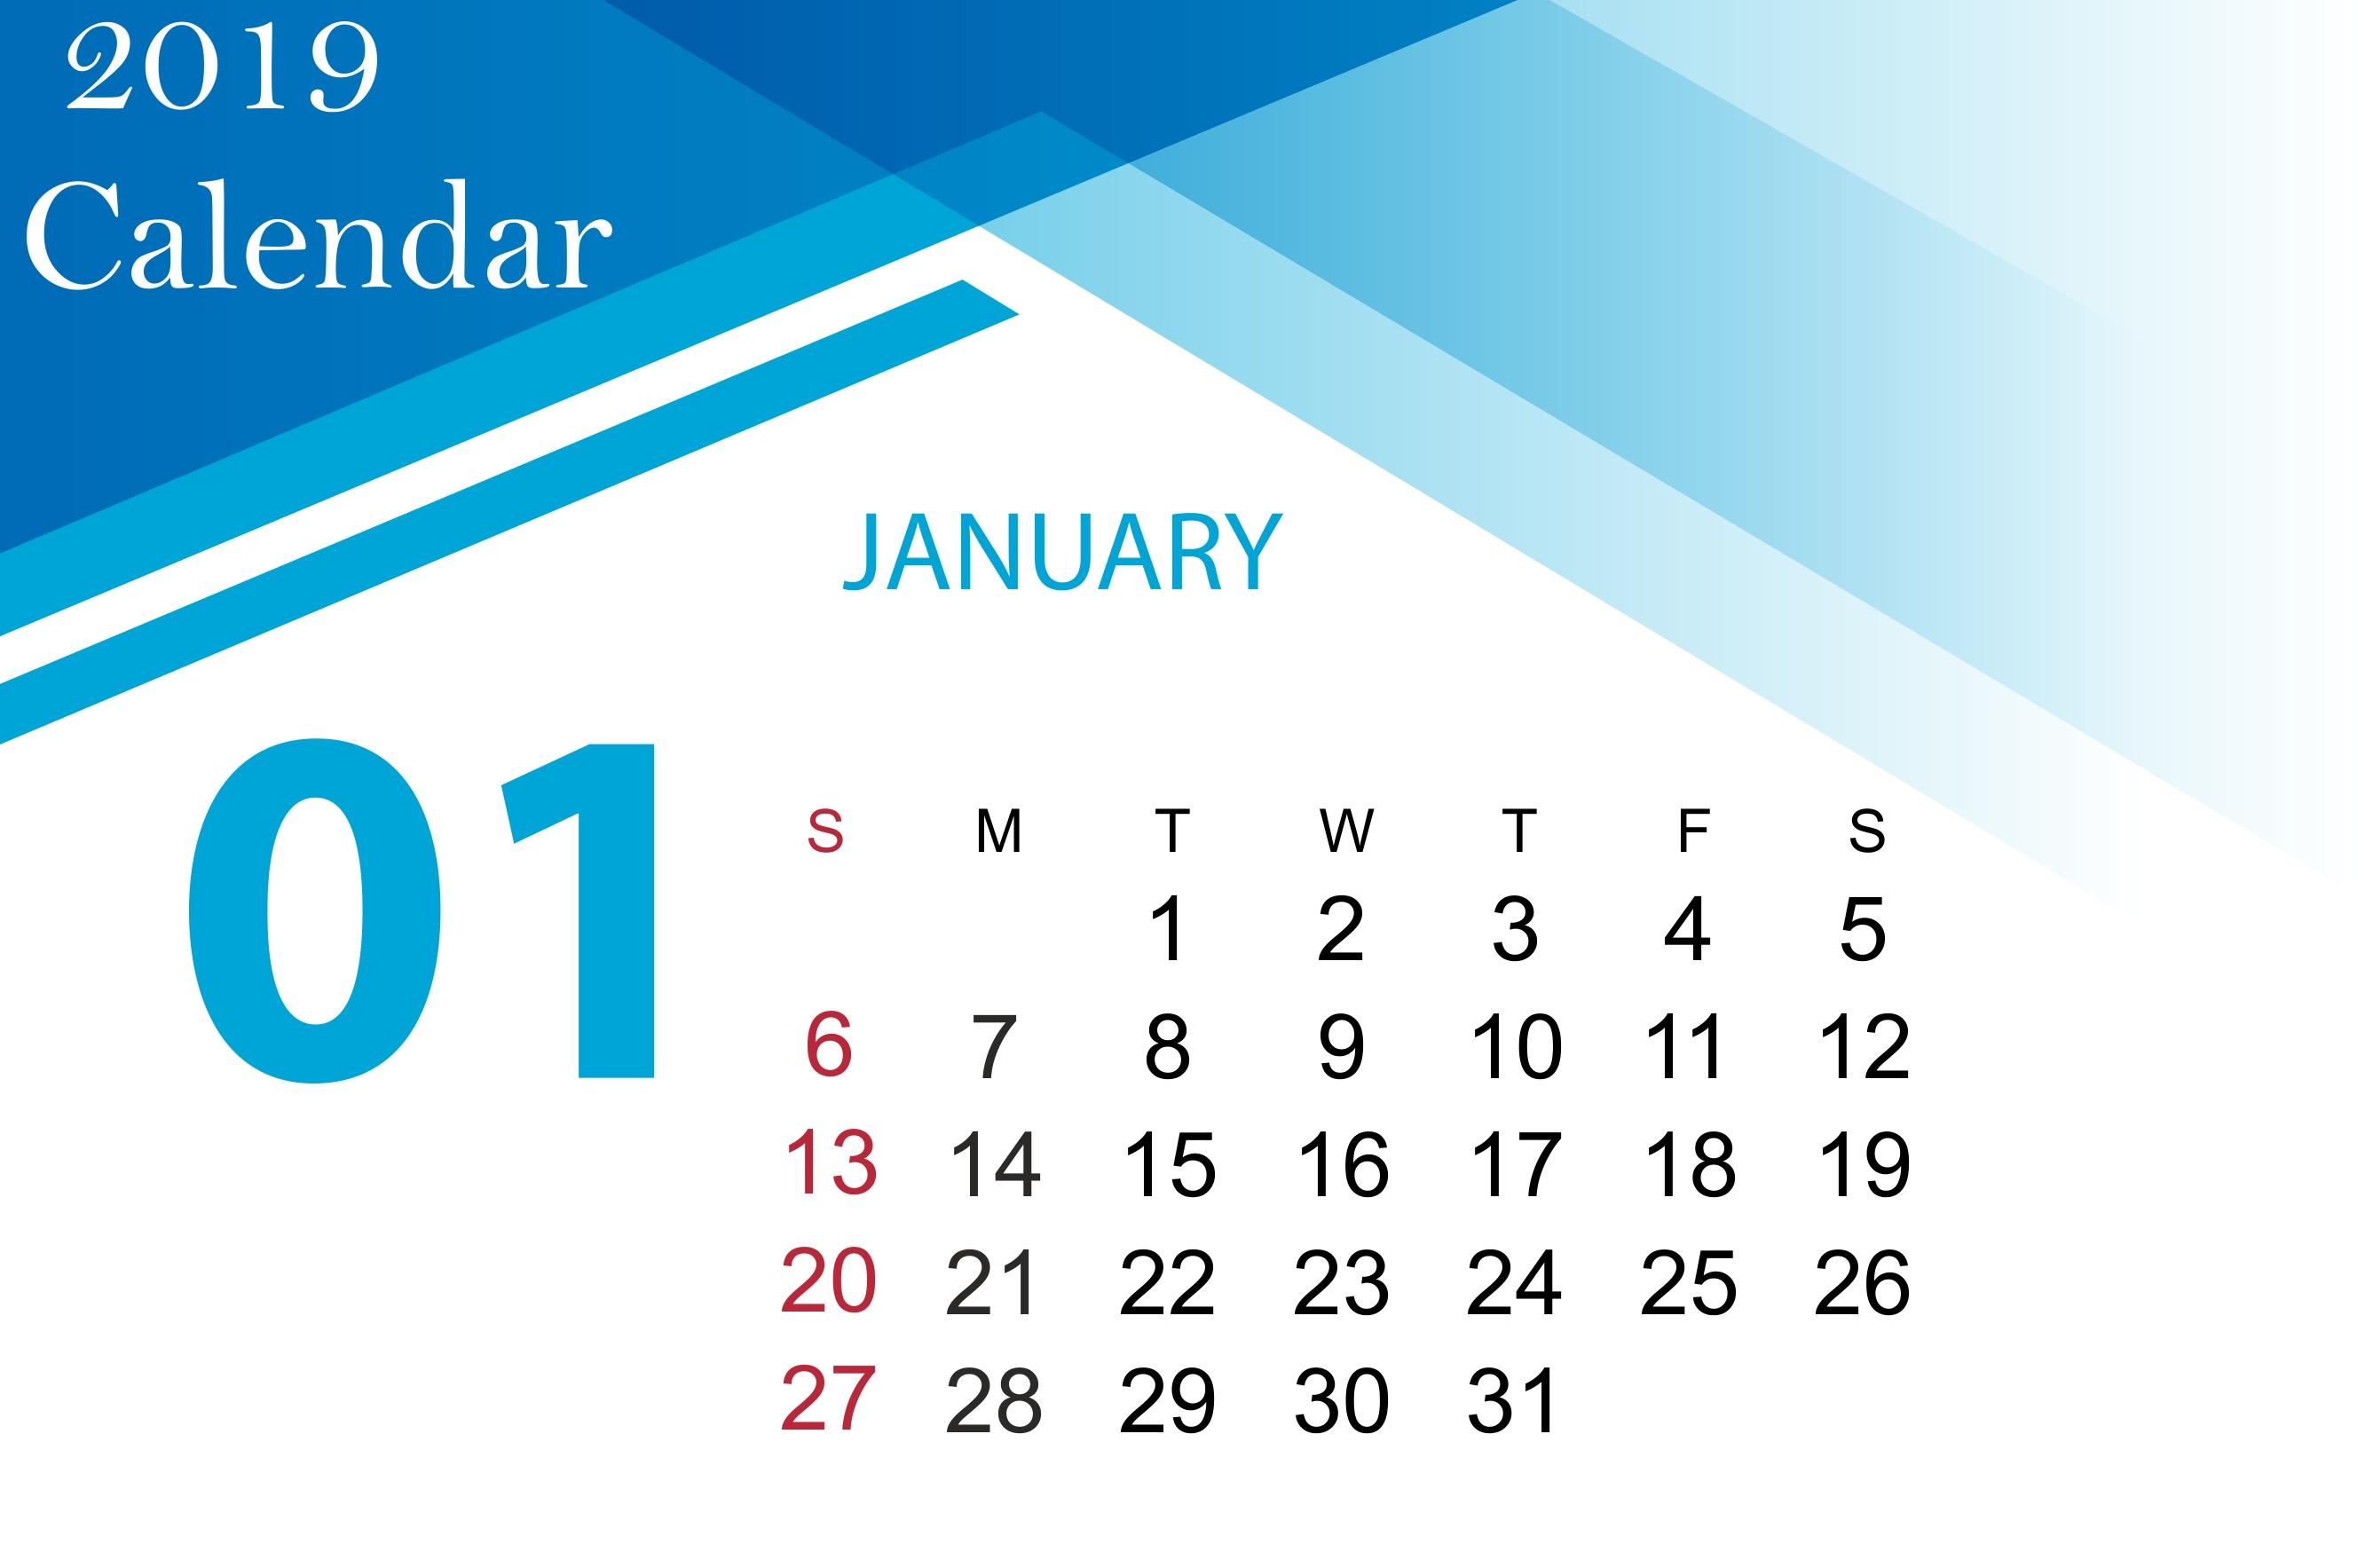 download 2019 january pdf excel word calendar template september::January 2019 Calendar Excel